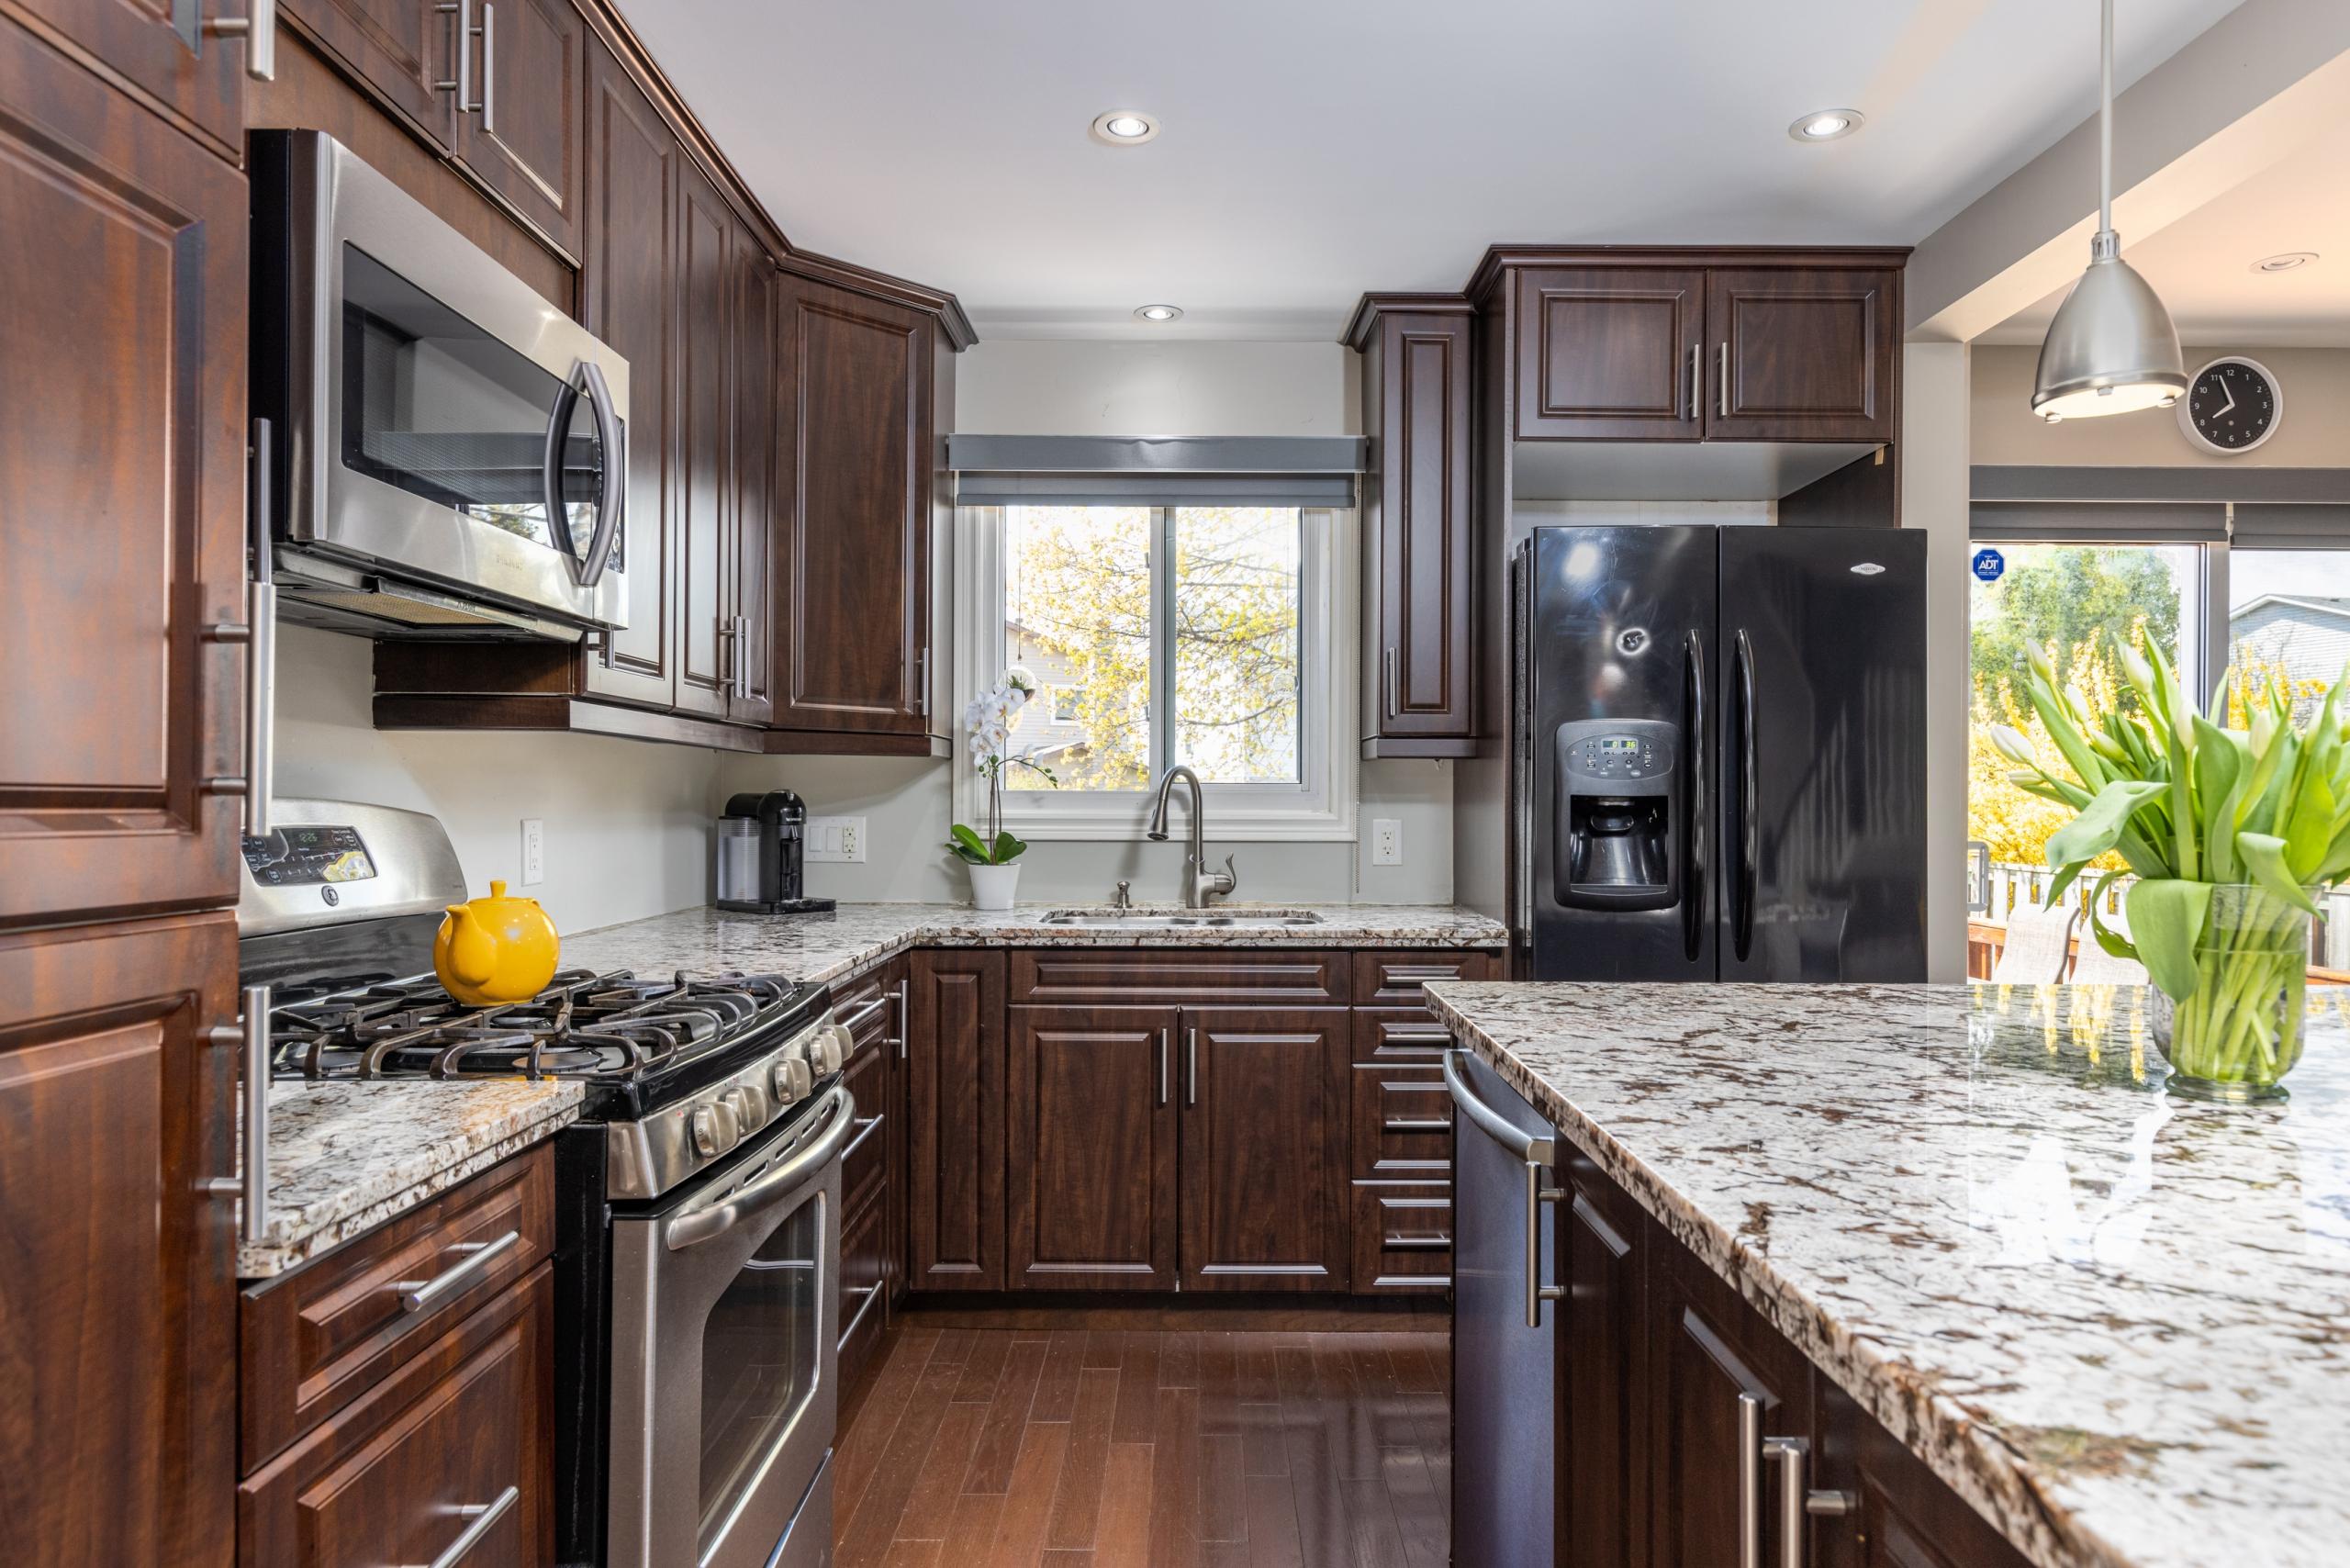 Kitchen featured at 3505 Quilter Court, Burlington, ON at Alex Irish & Associates